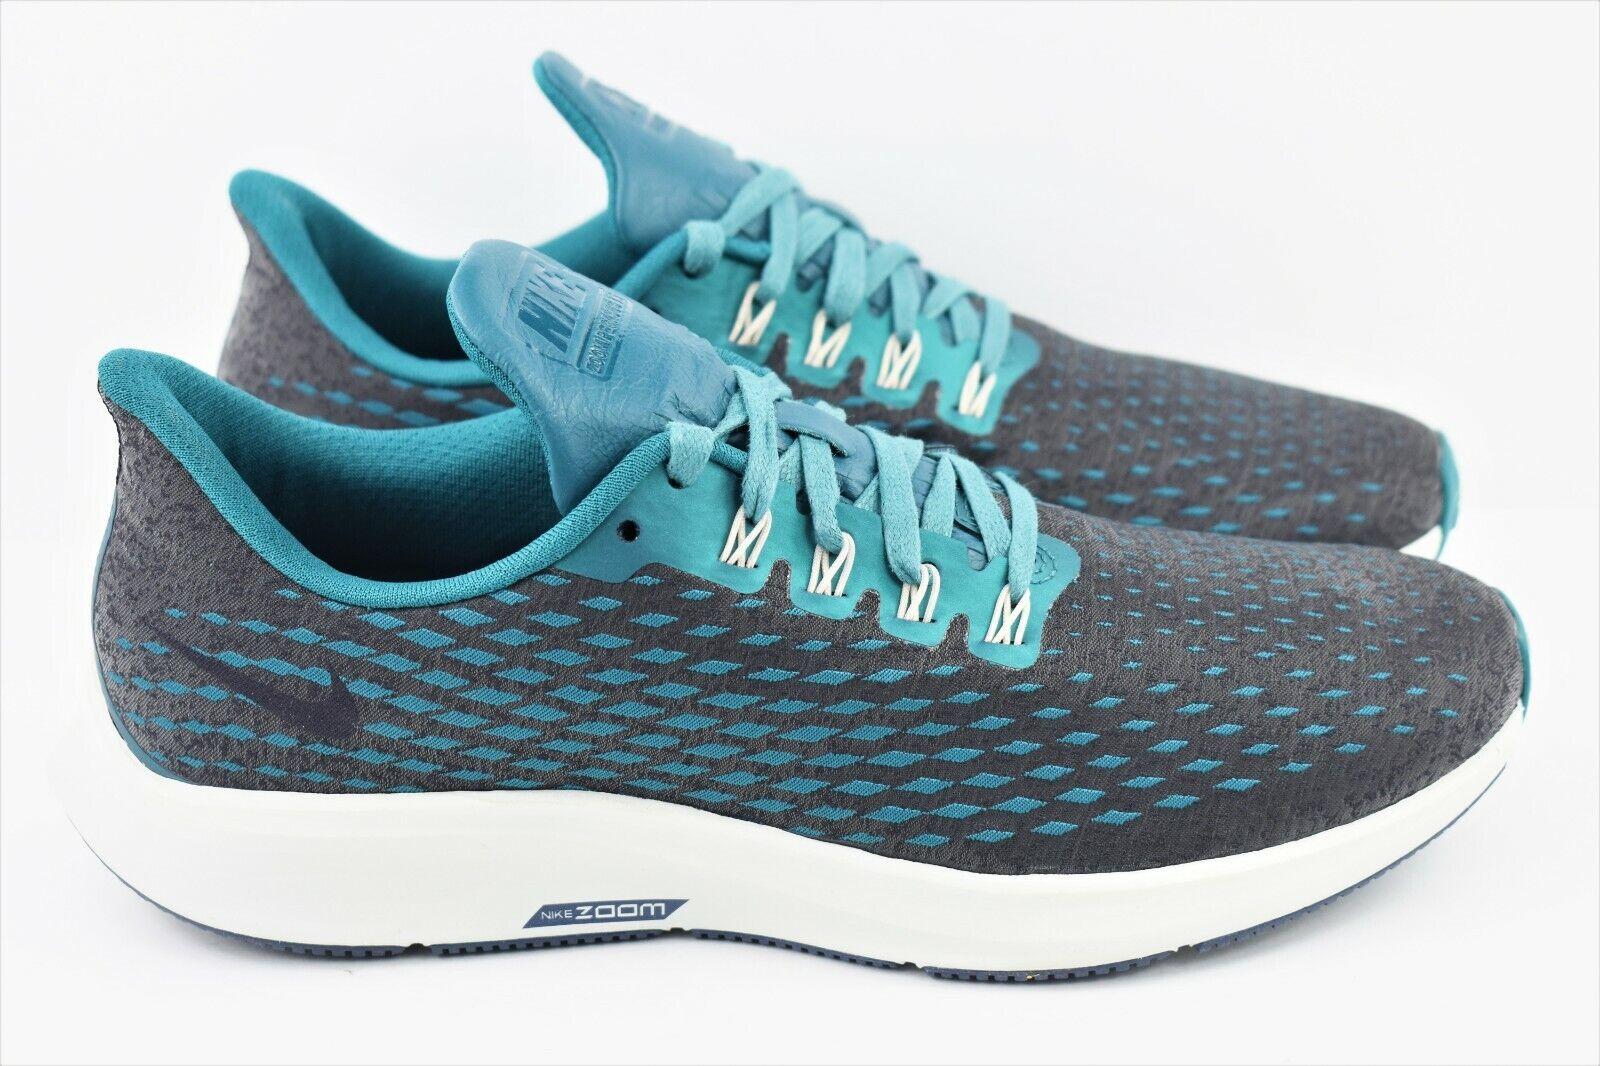 donna Nike Air Zoom Pegasus 35 Premium Dimensione 10.5 Running  scarpe AH8392 300 Teal  negozio di sconto